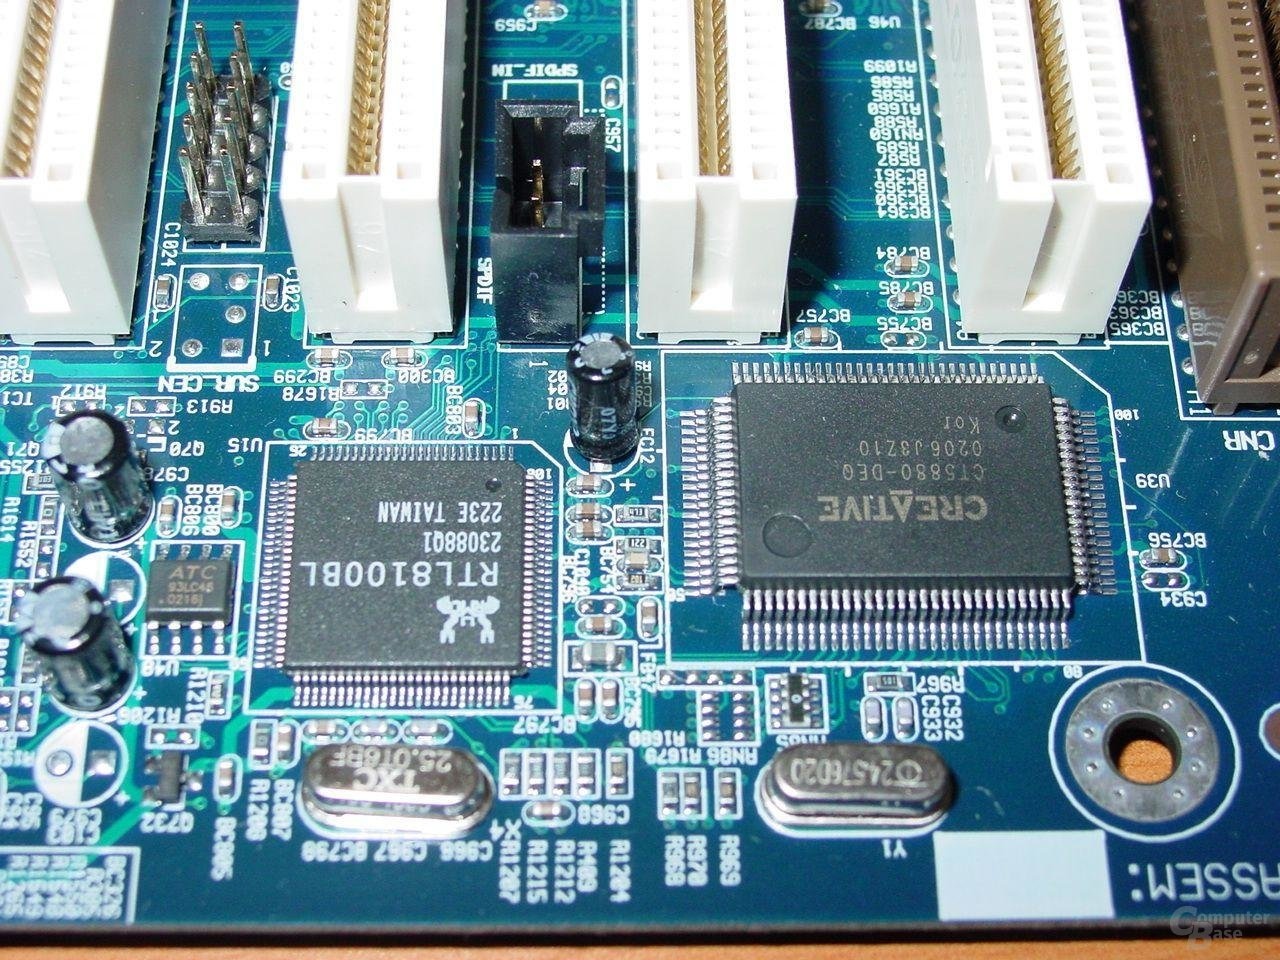 CT5880 Soundchip